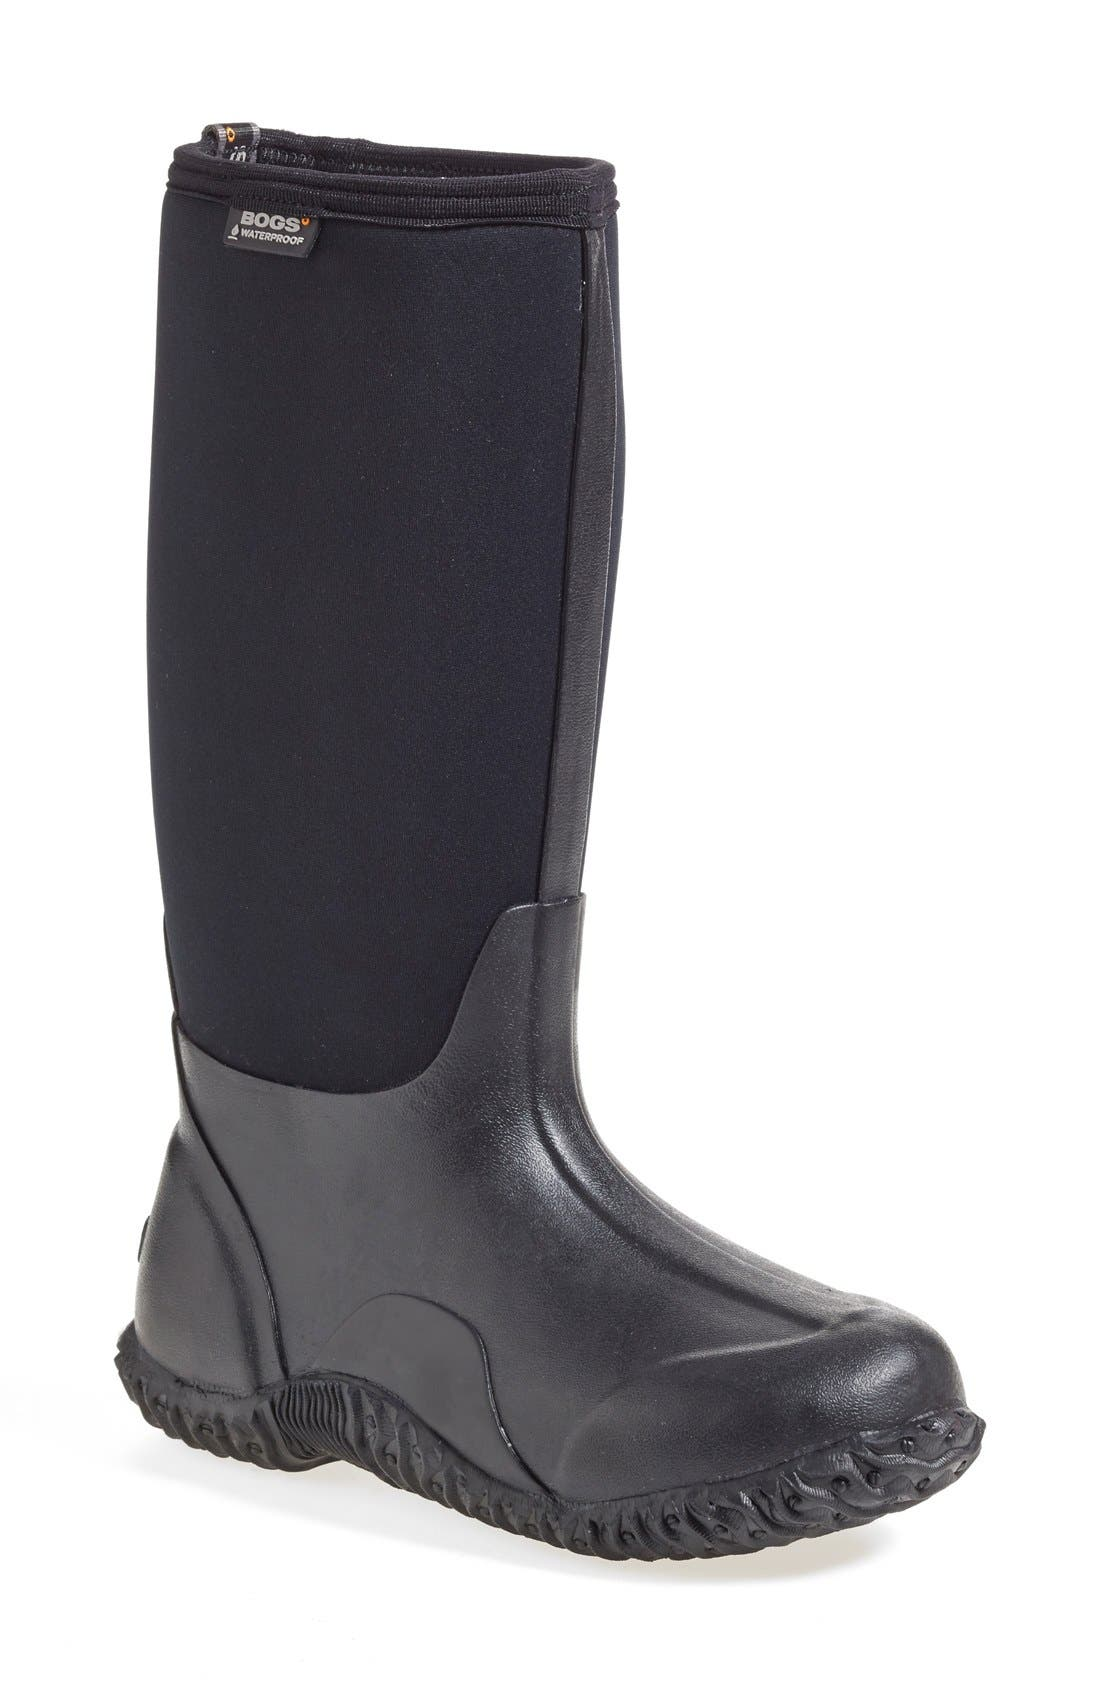 'Classic' High Waterproof Snow Boot